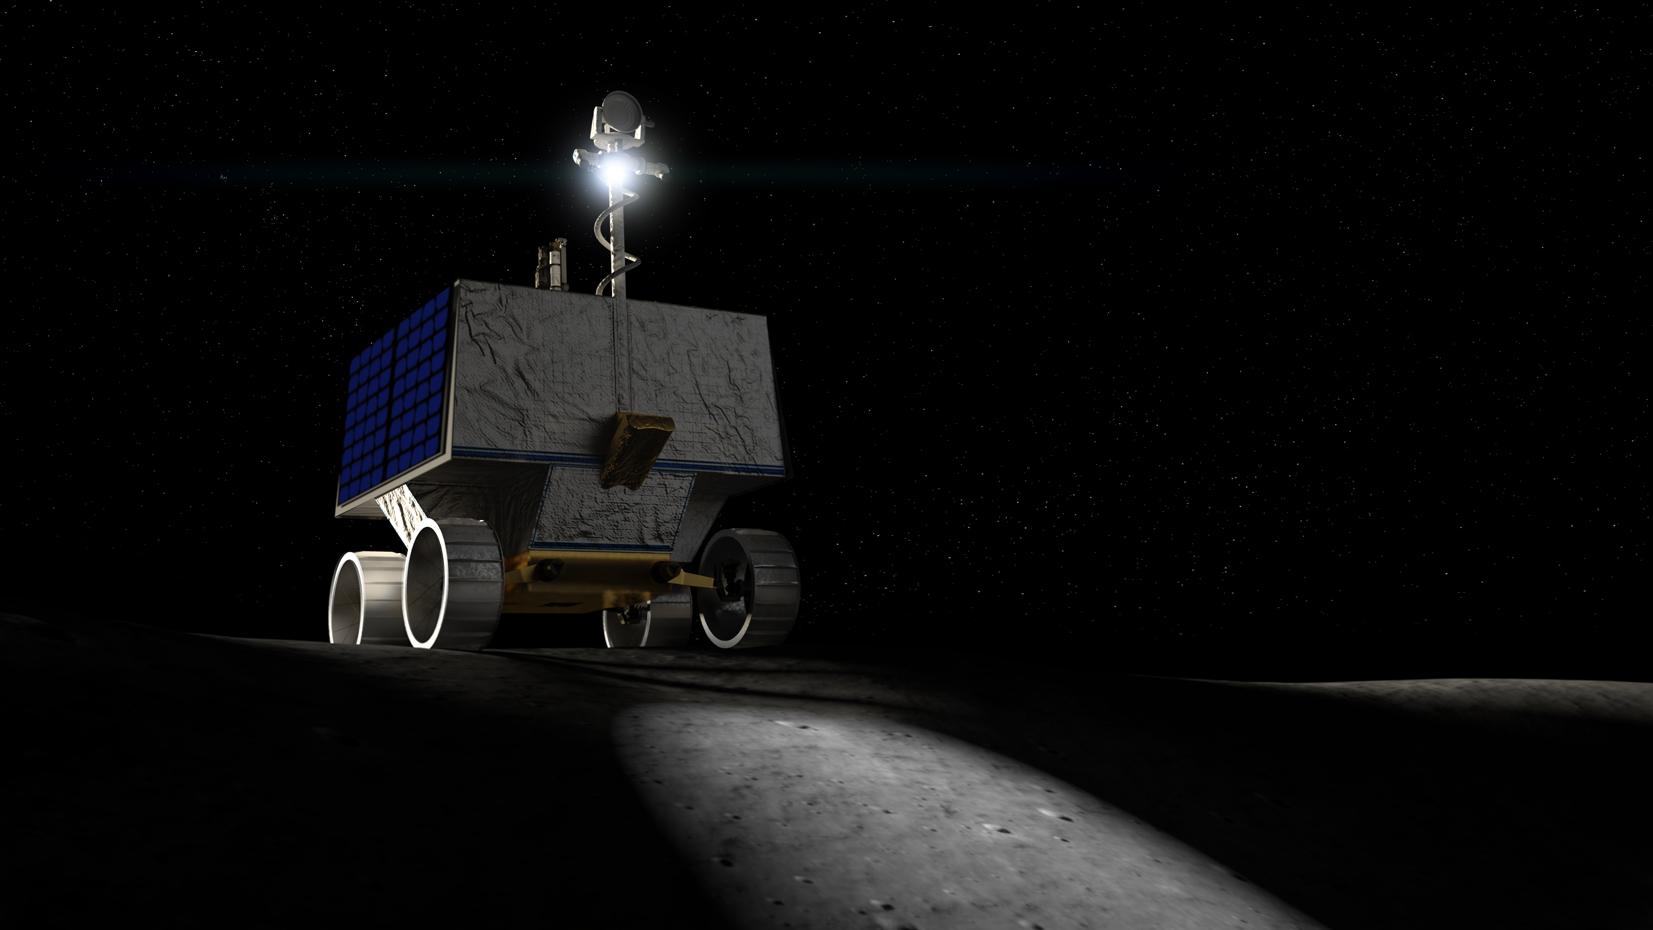 Le rover Viper de la NASA ira rechercher de l'eau sur la Lune